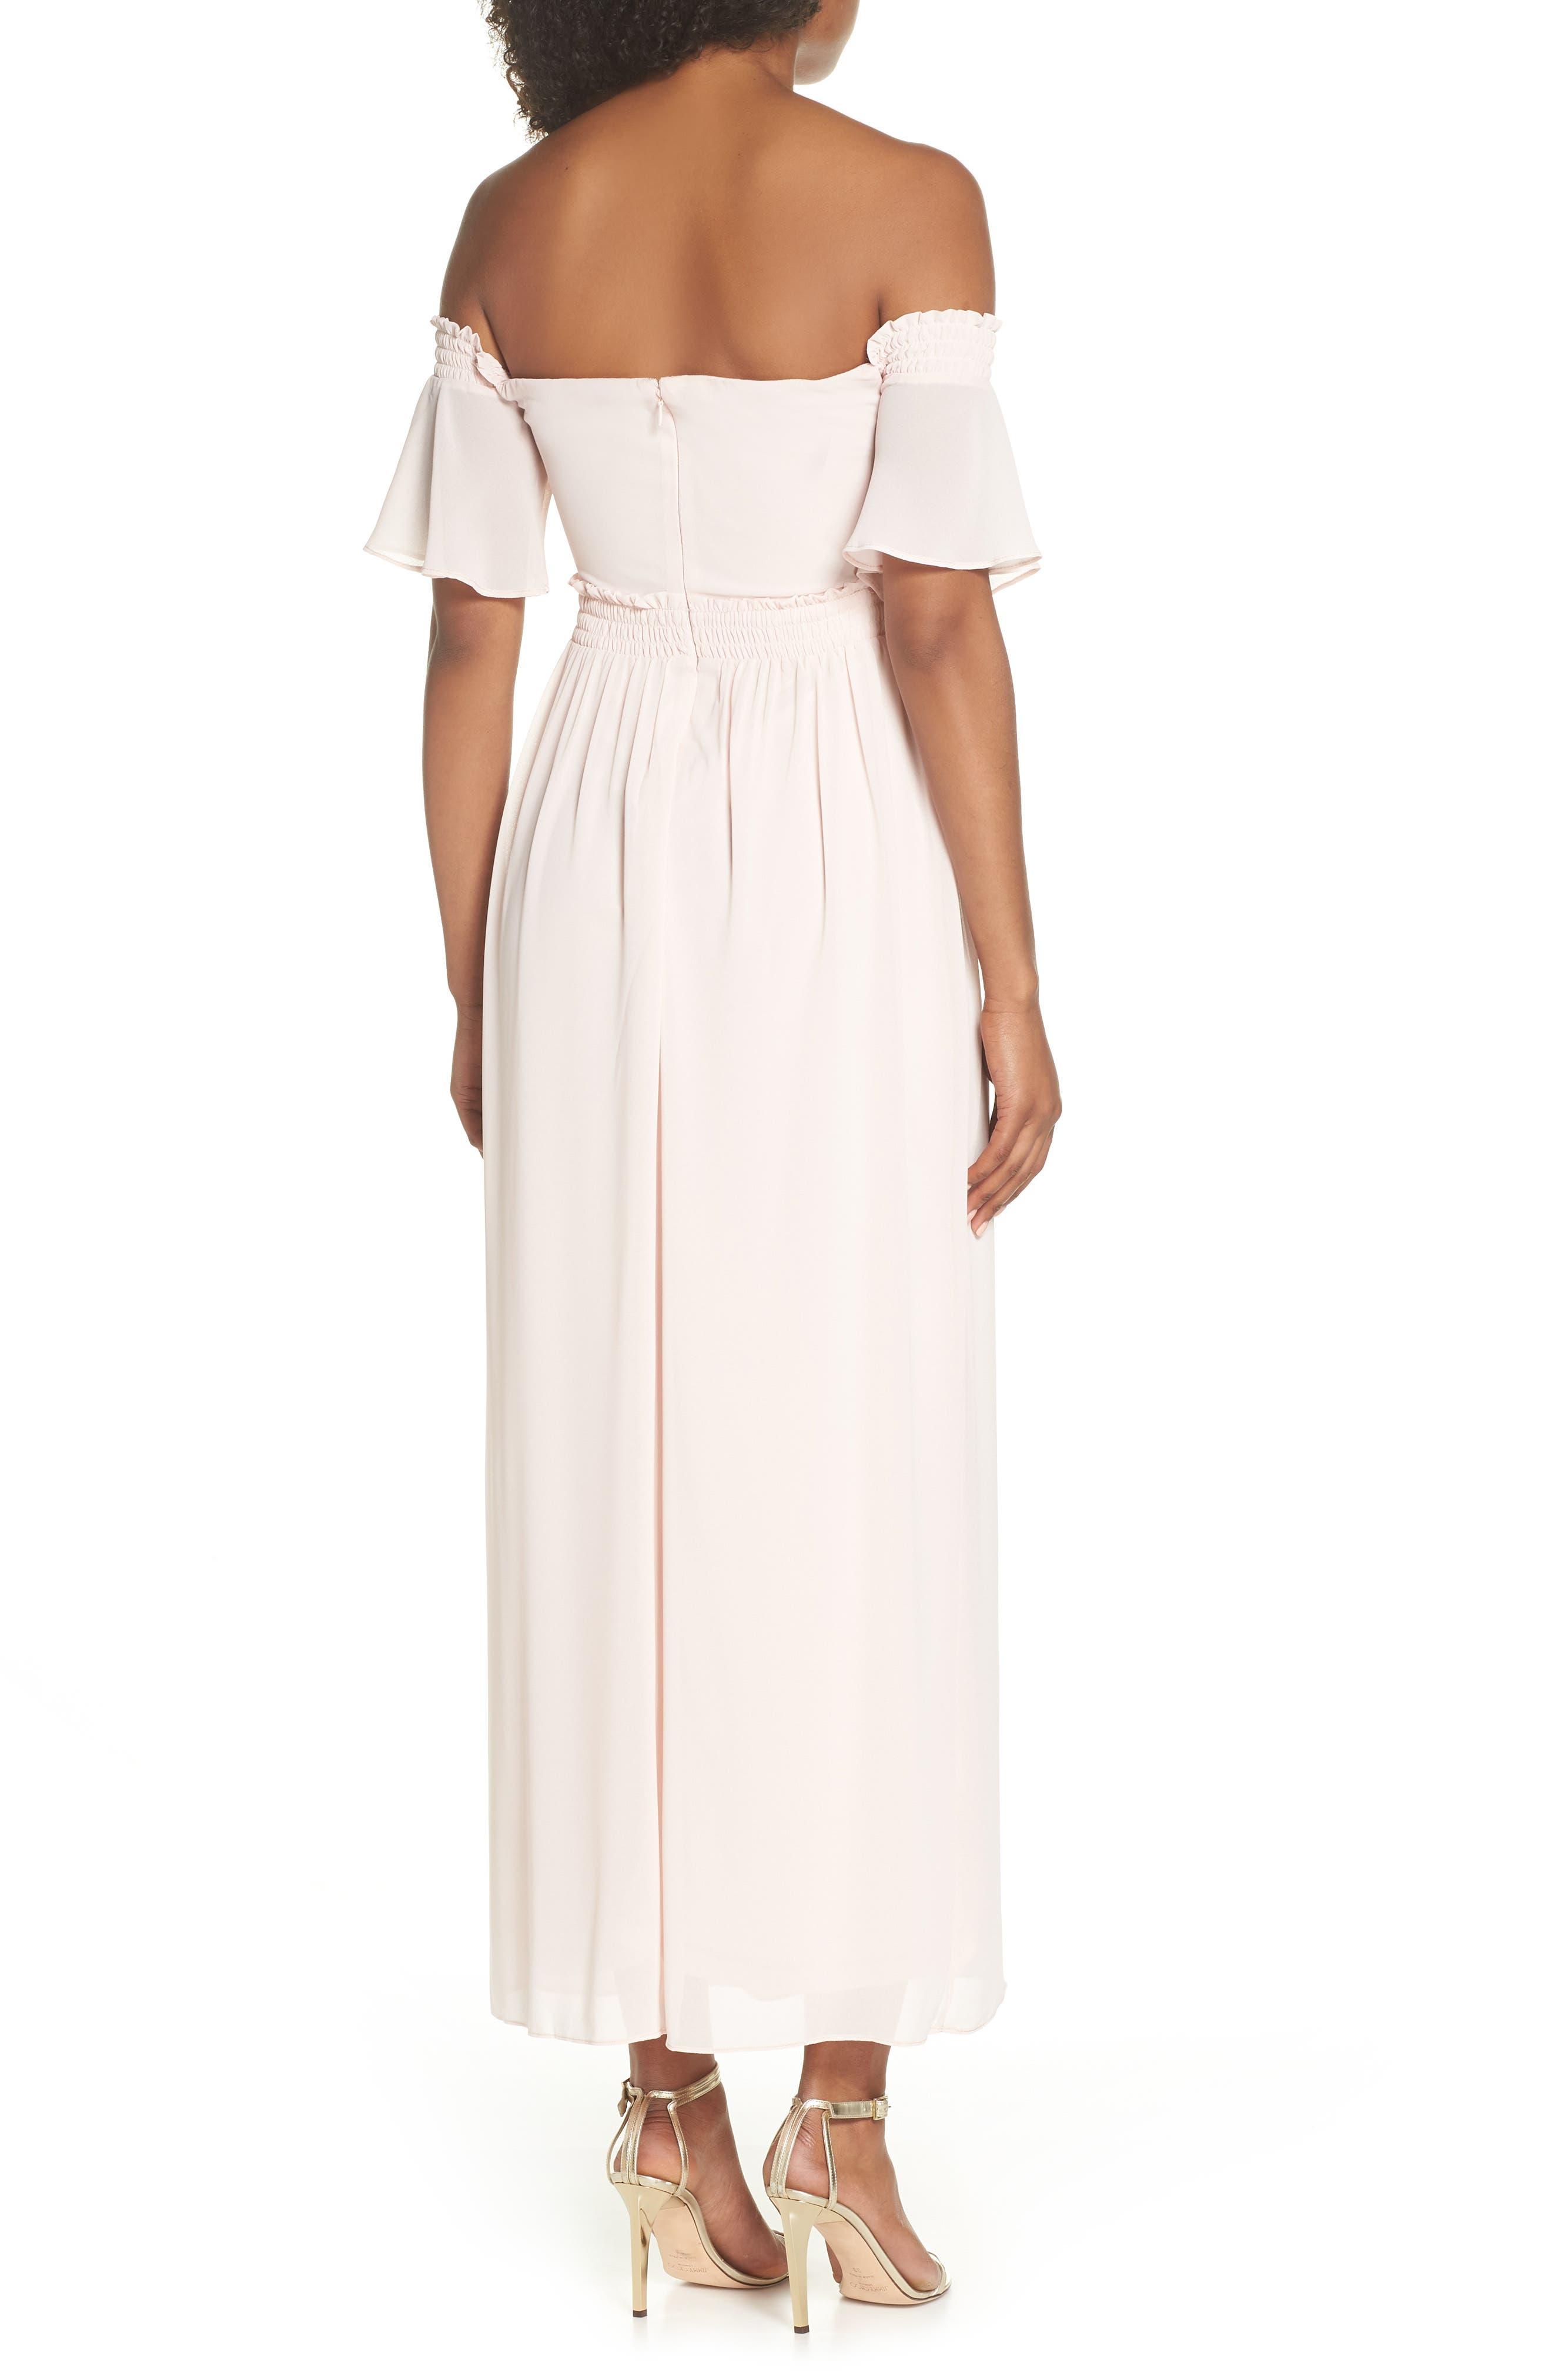 Freida Off the Shoulder Maxi Dress,                             Alternate thumbnail 2, color,                             Peach Blush